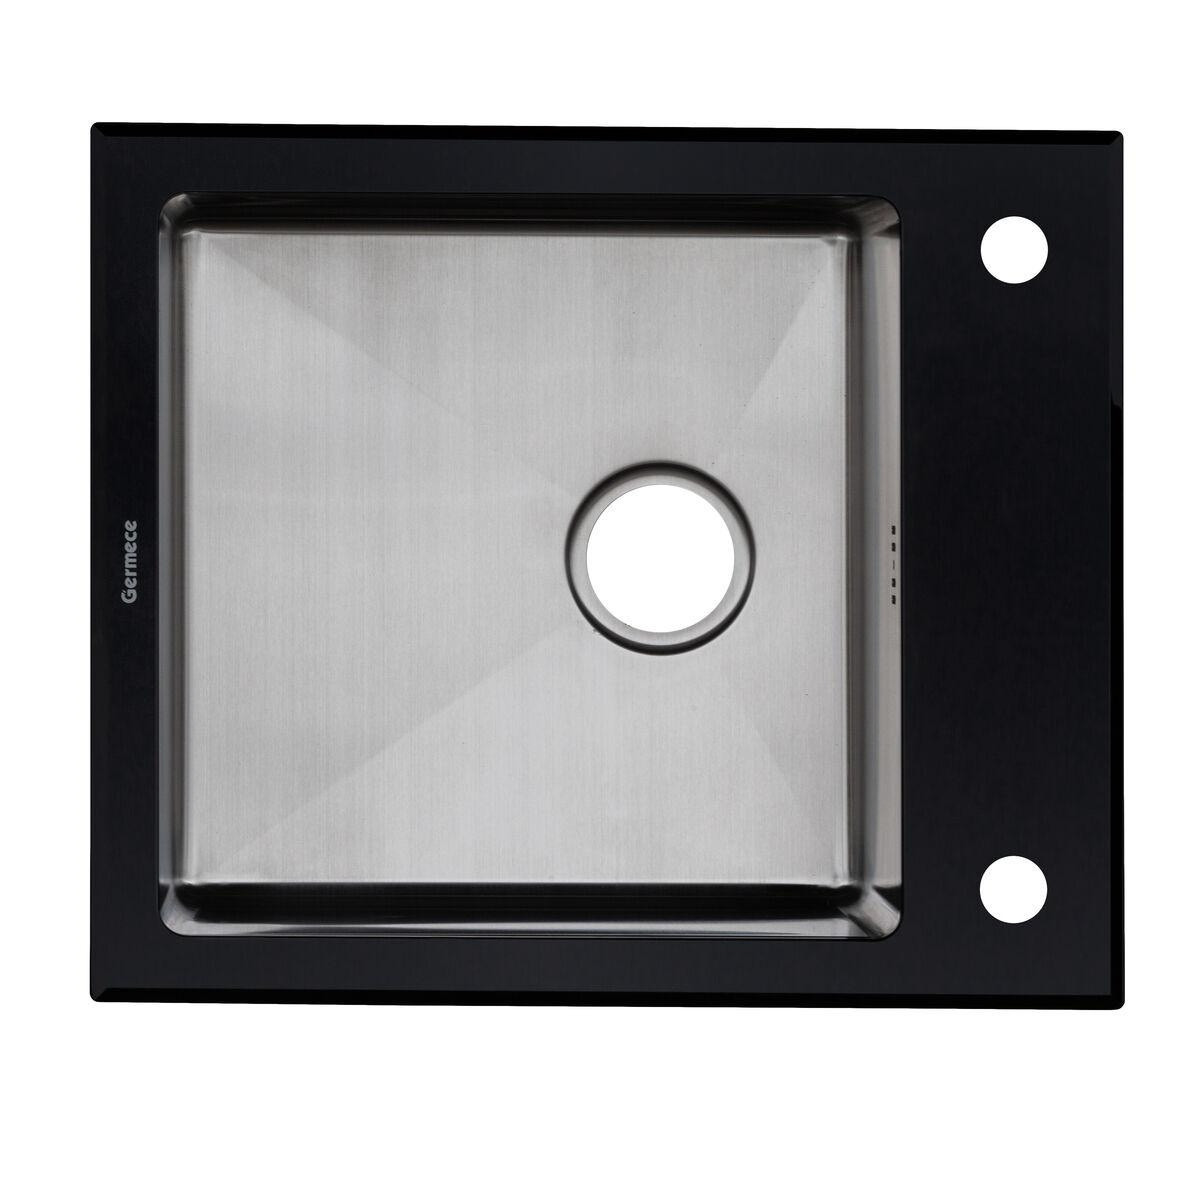 Кухонная мойка Germece Handmade BLACK GLASS 6051/200 сталь/стекло черная 60х51